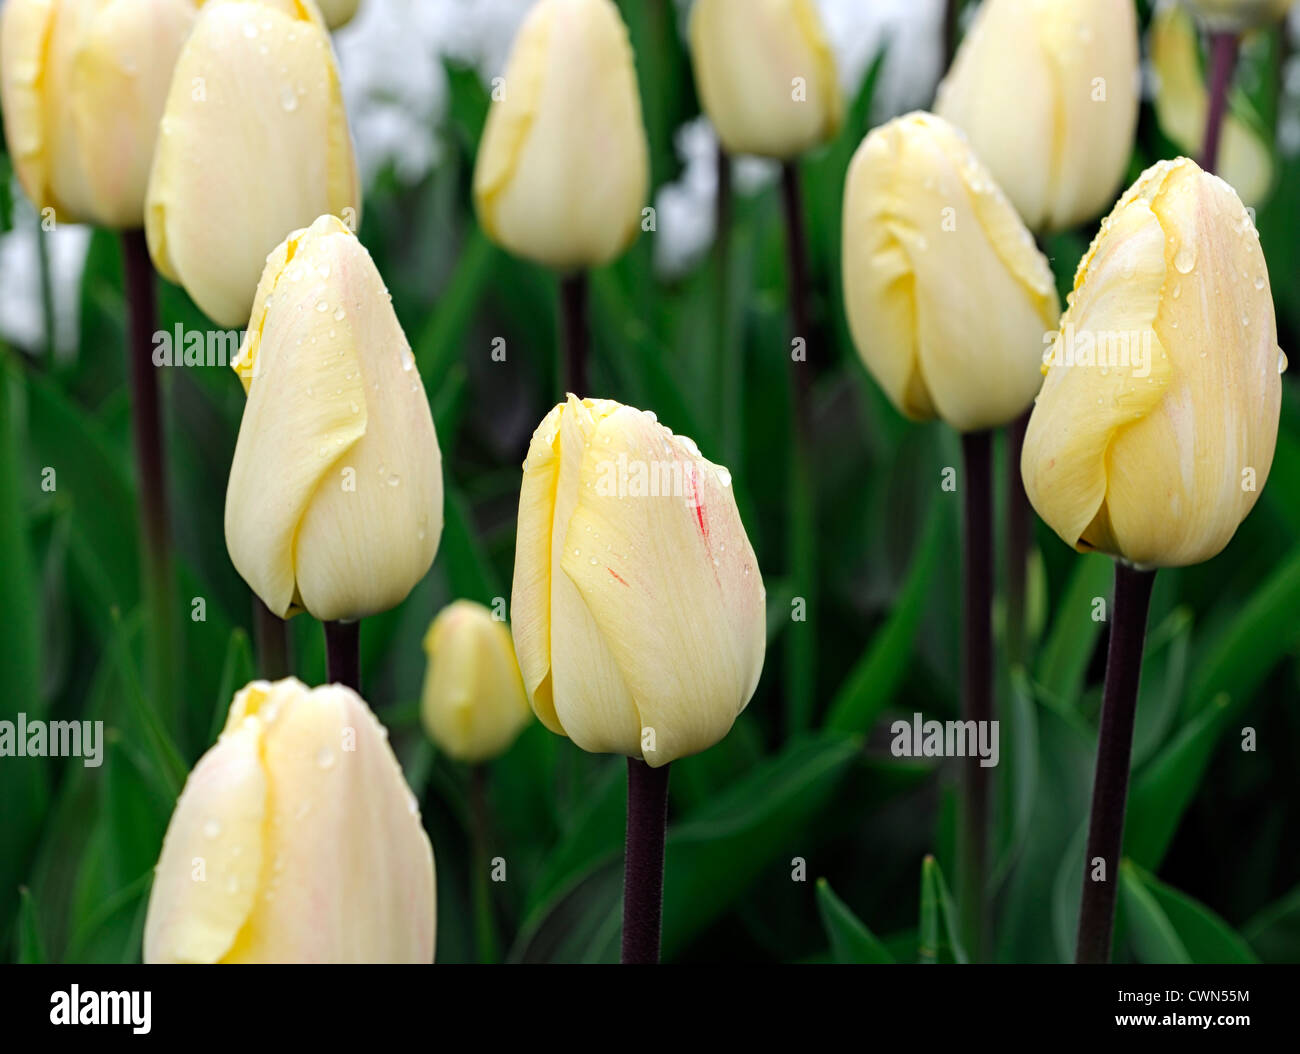 Pale Yellow Tulip Stock Photos & Pale Yellow Tulip Stock Images - Alamy